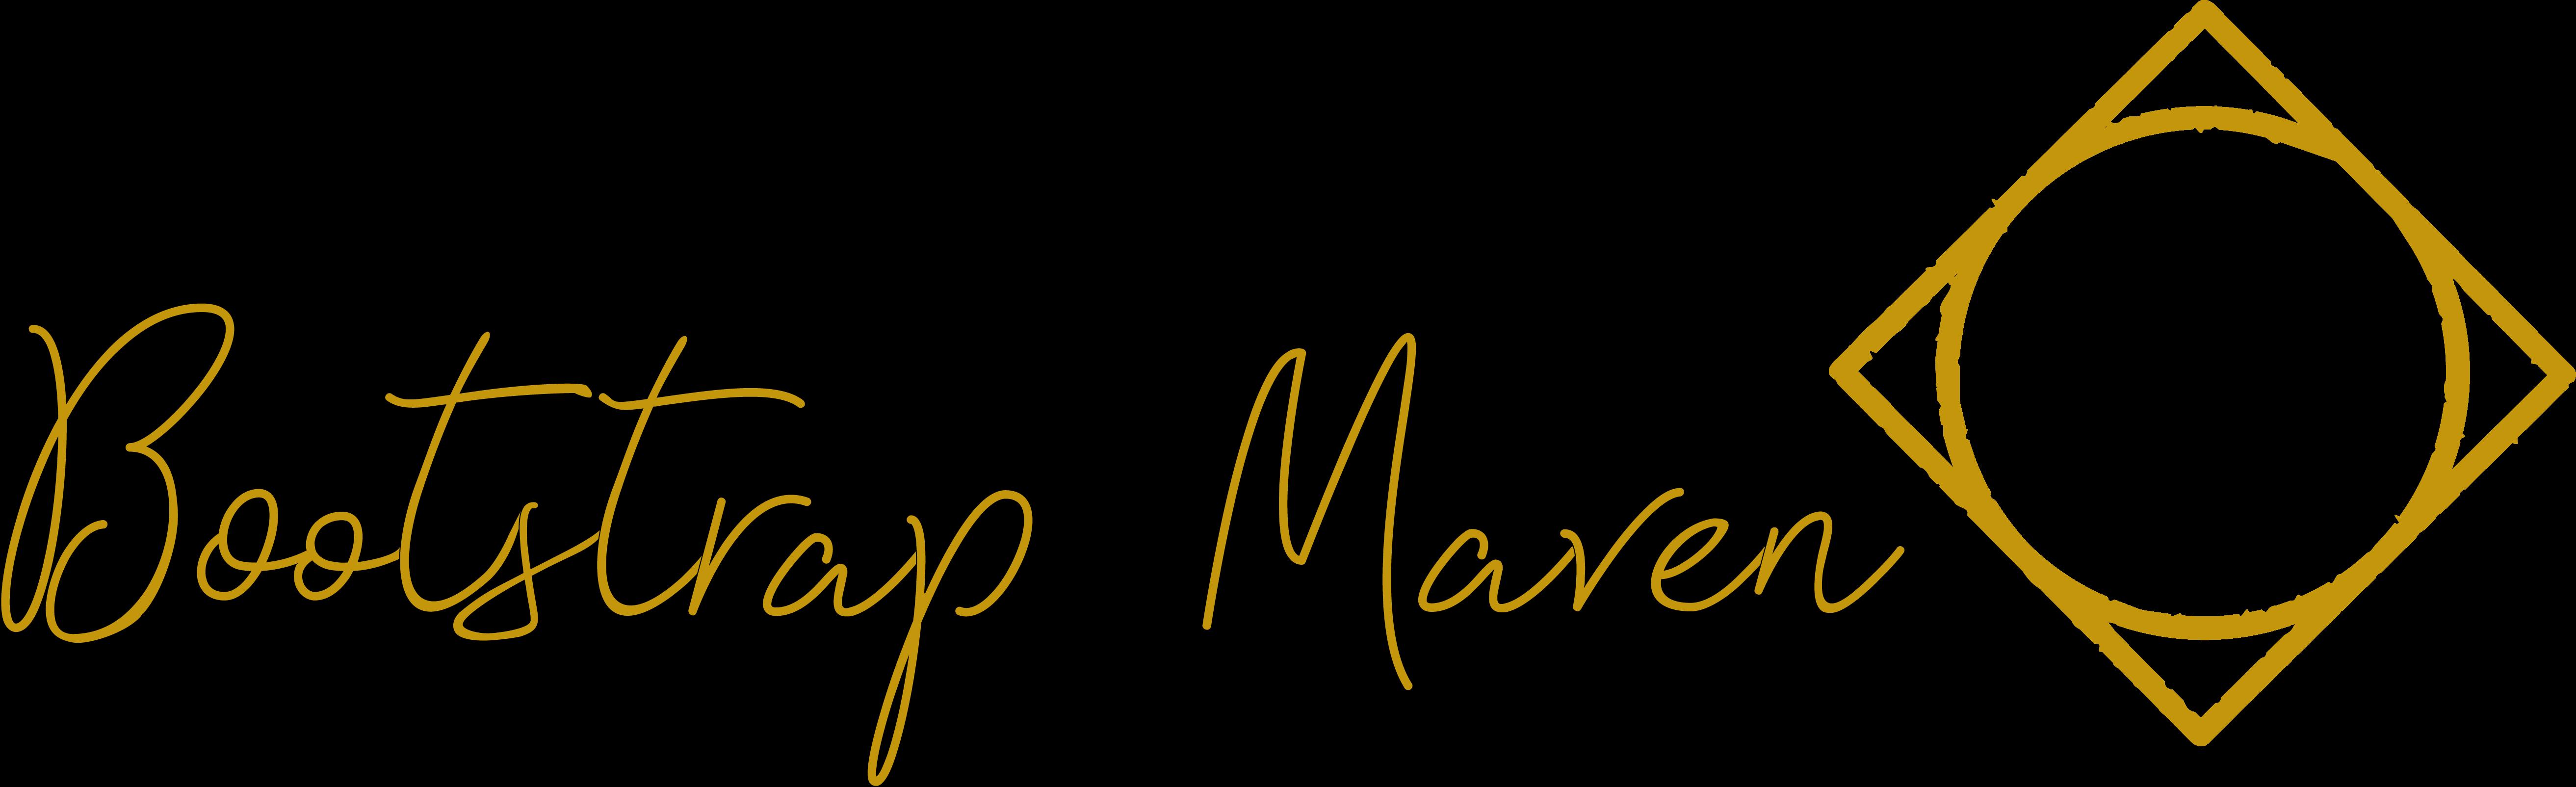 Bootstrap Maven